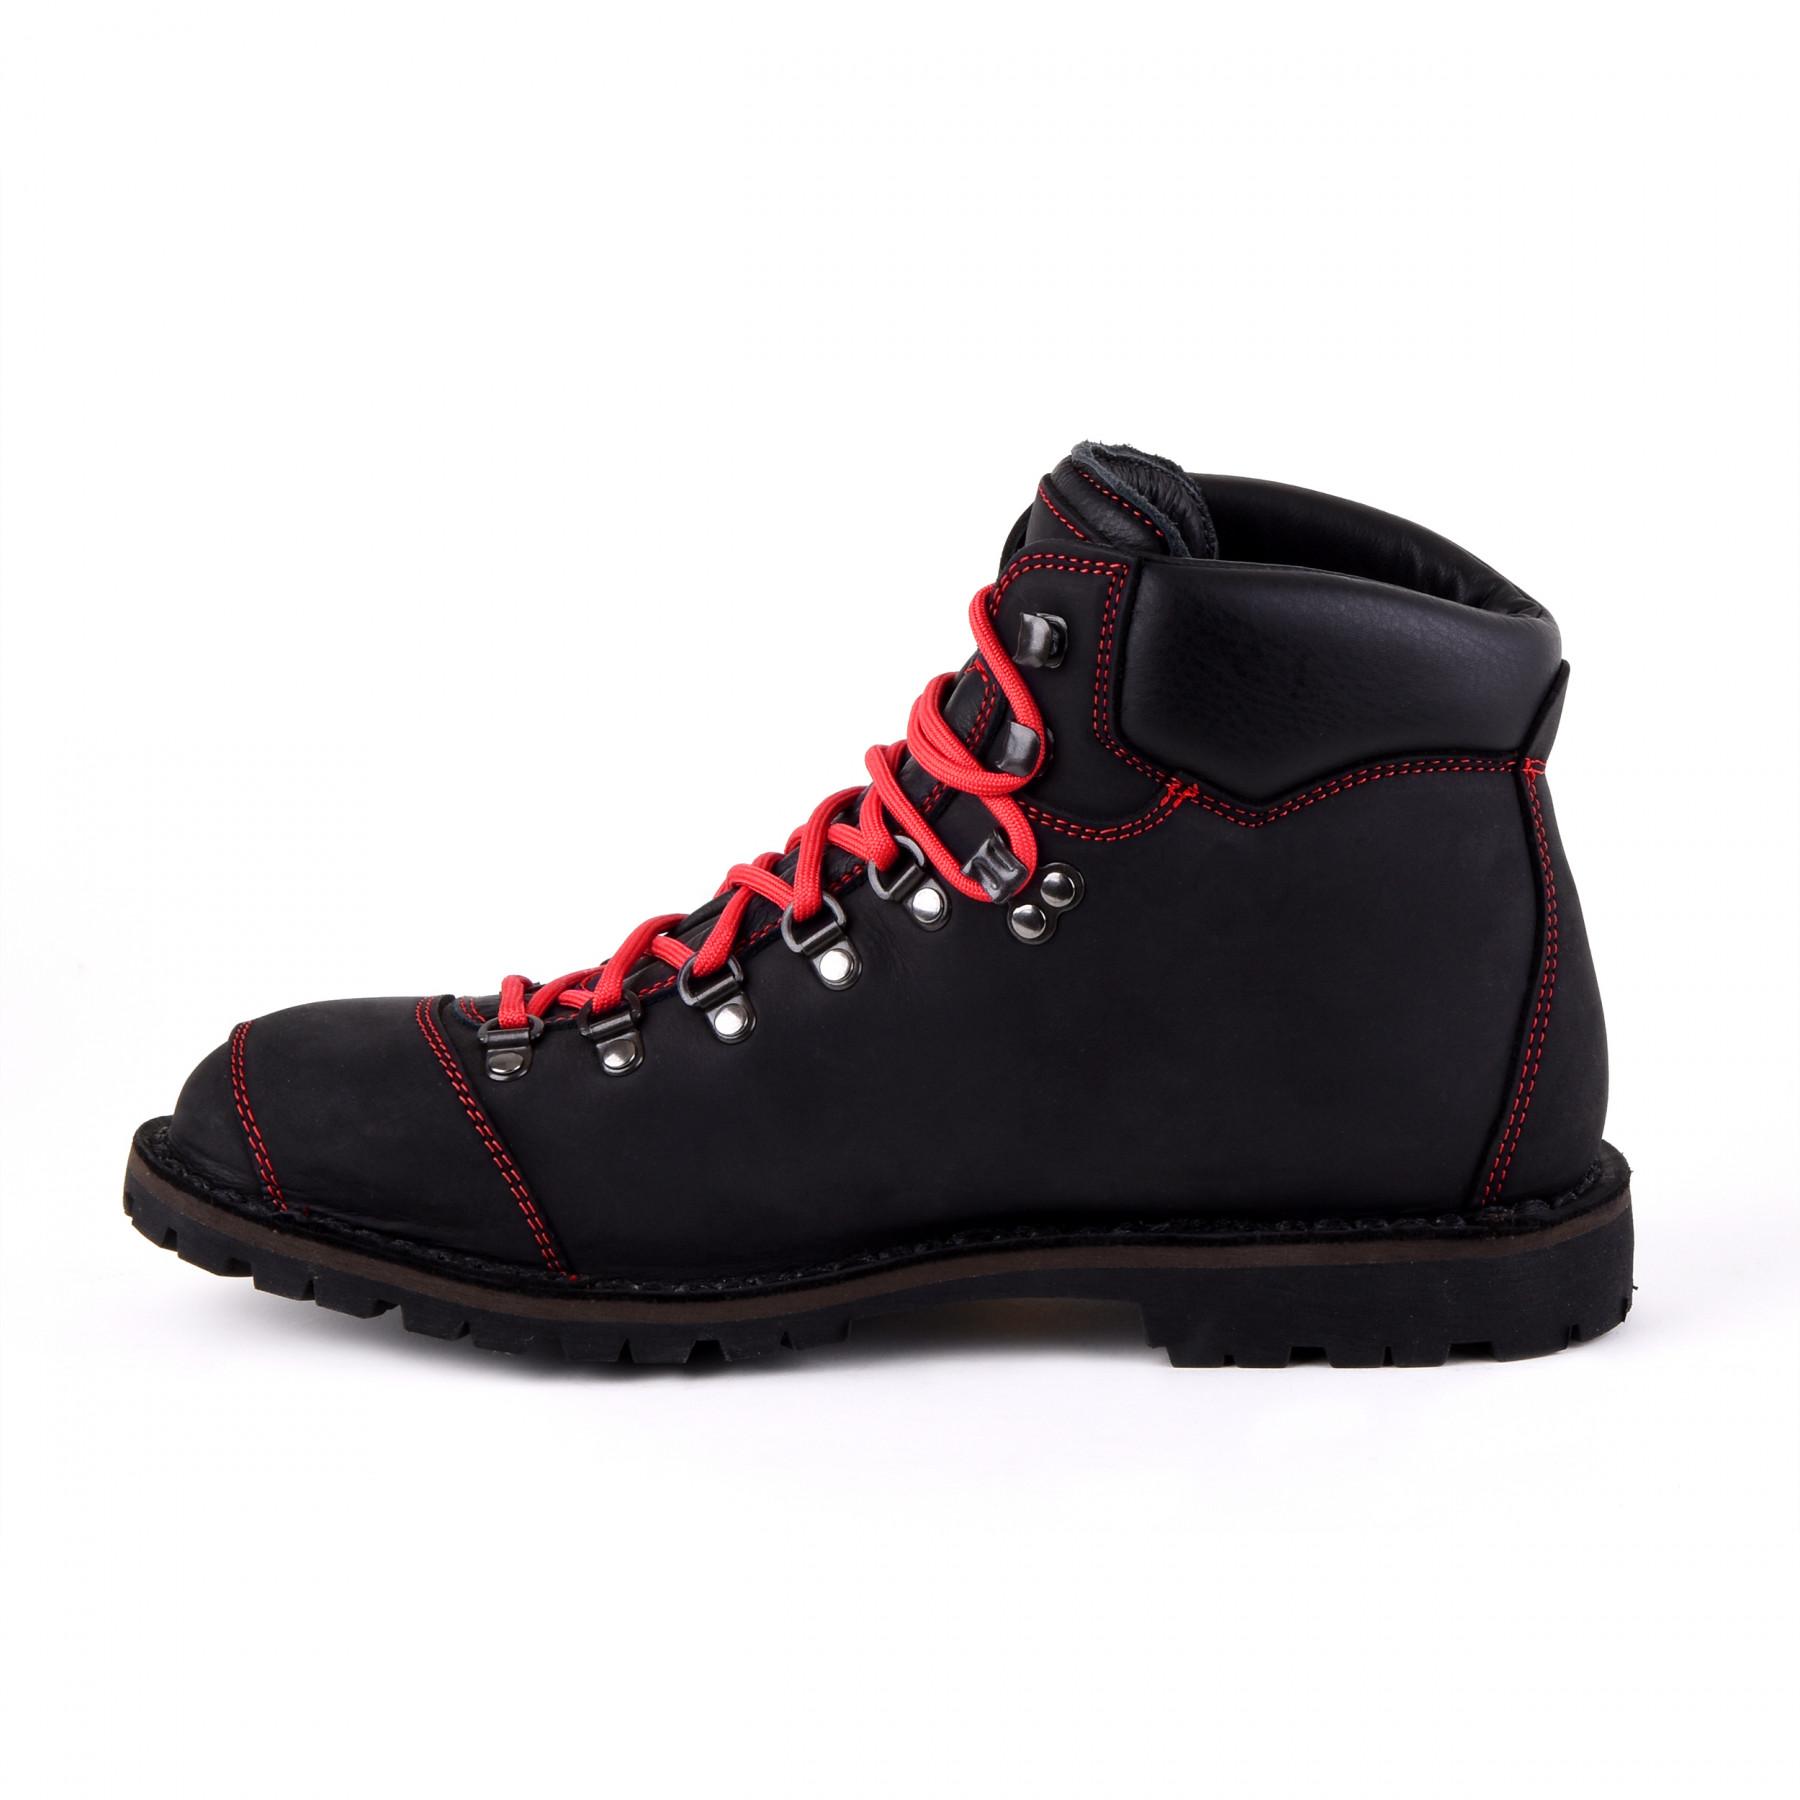 Biker Boot Adventure Denver Black, zwarte dames boot, rood stiksel